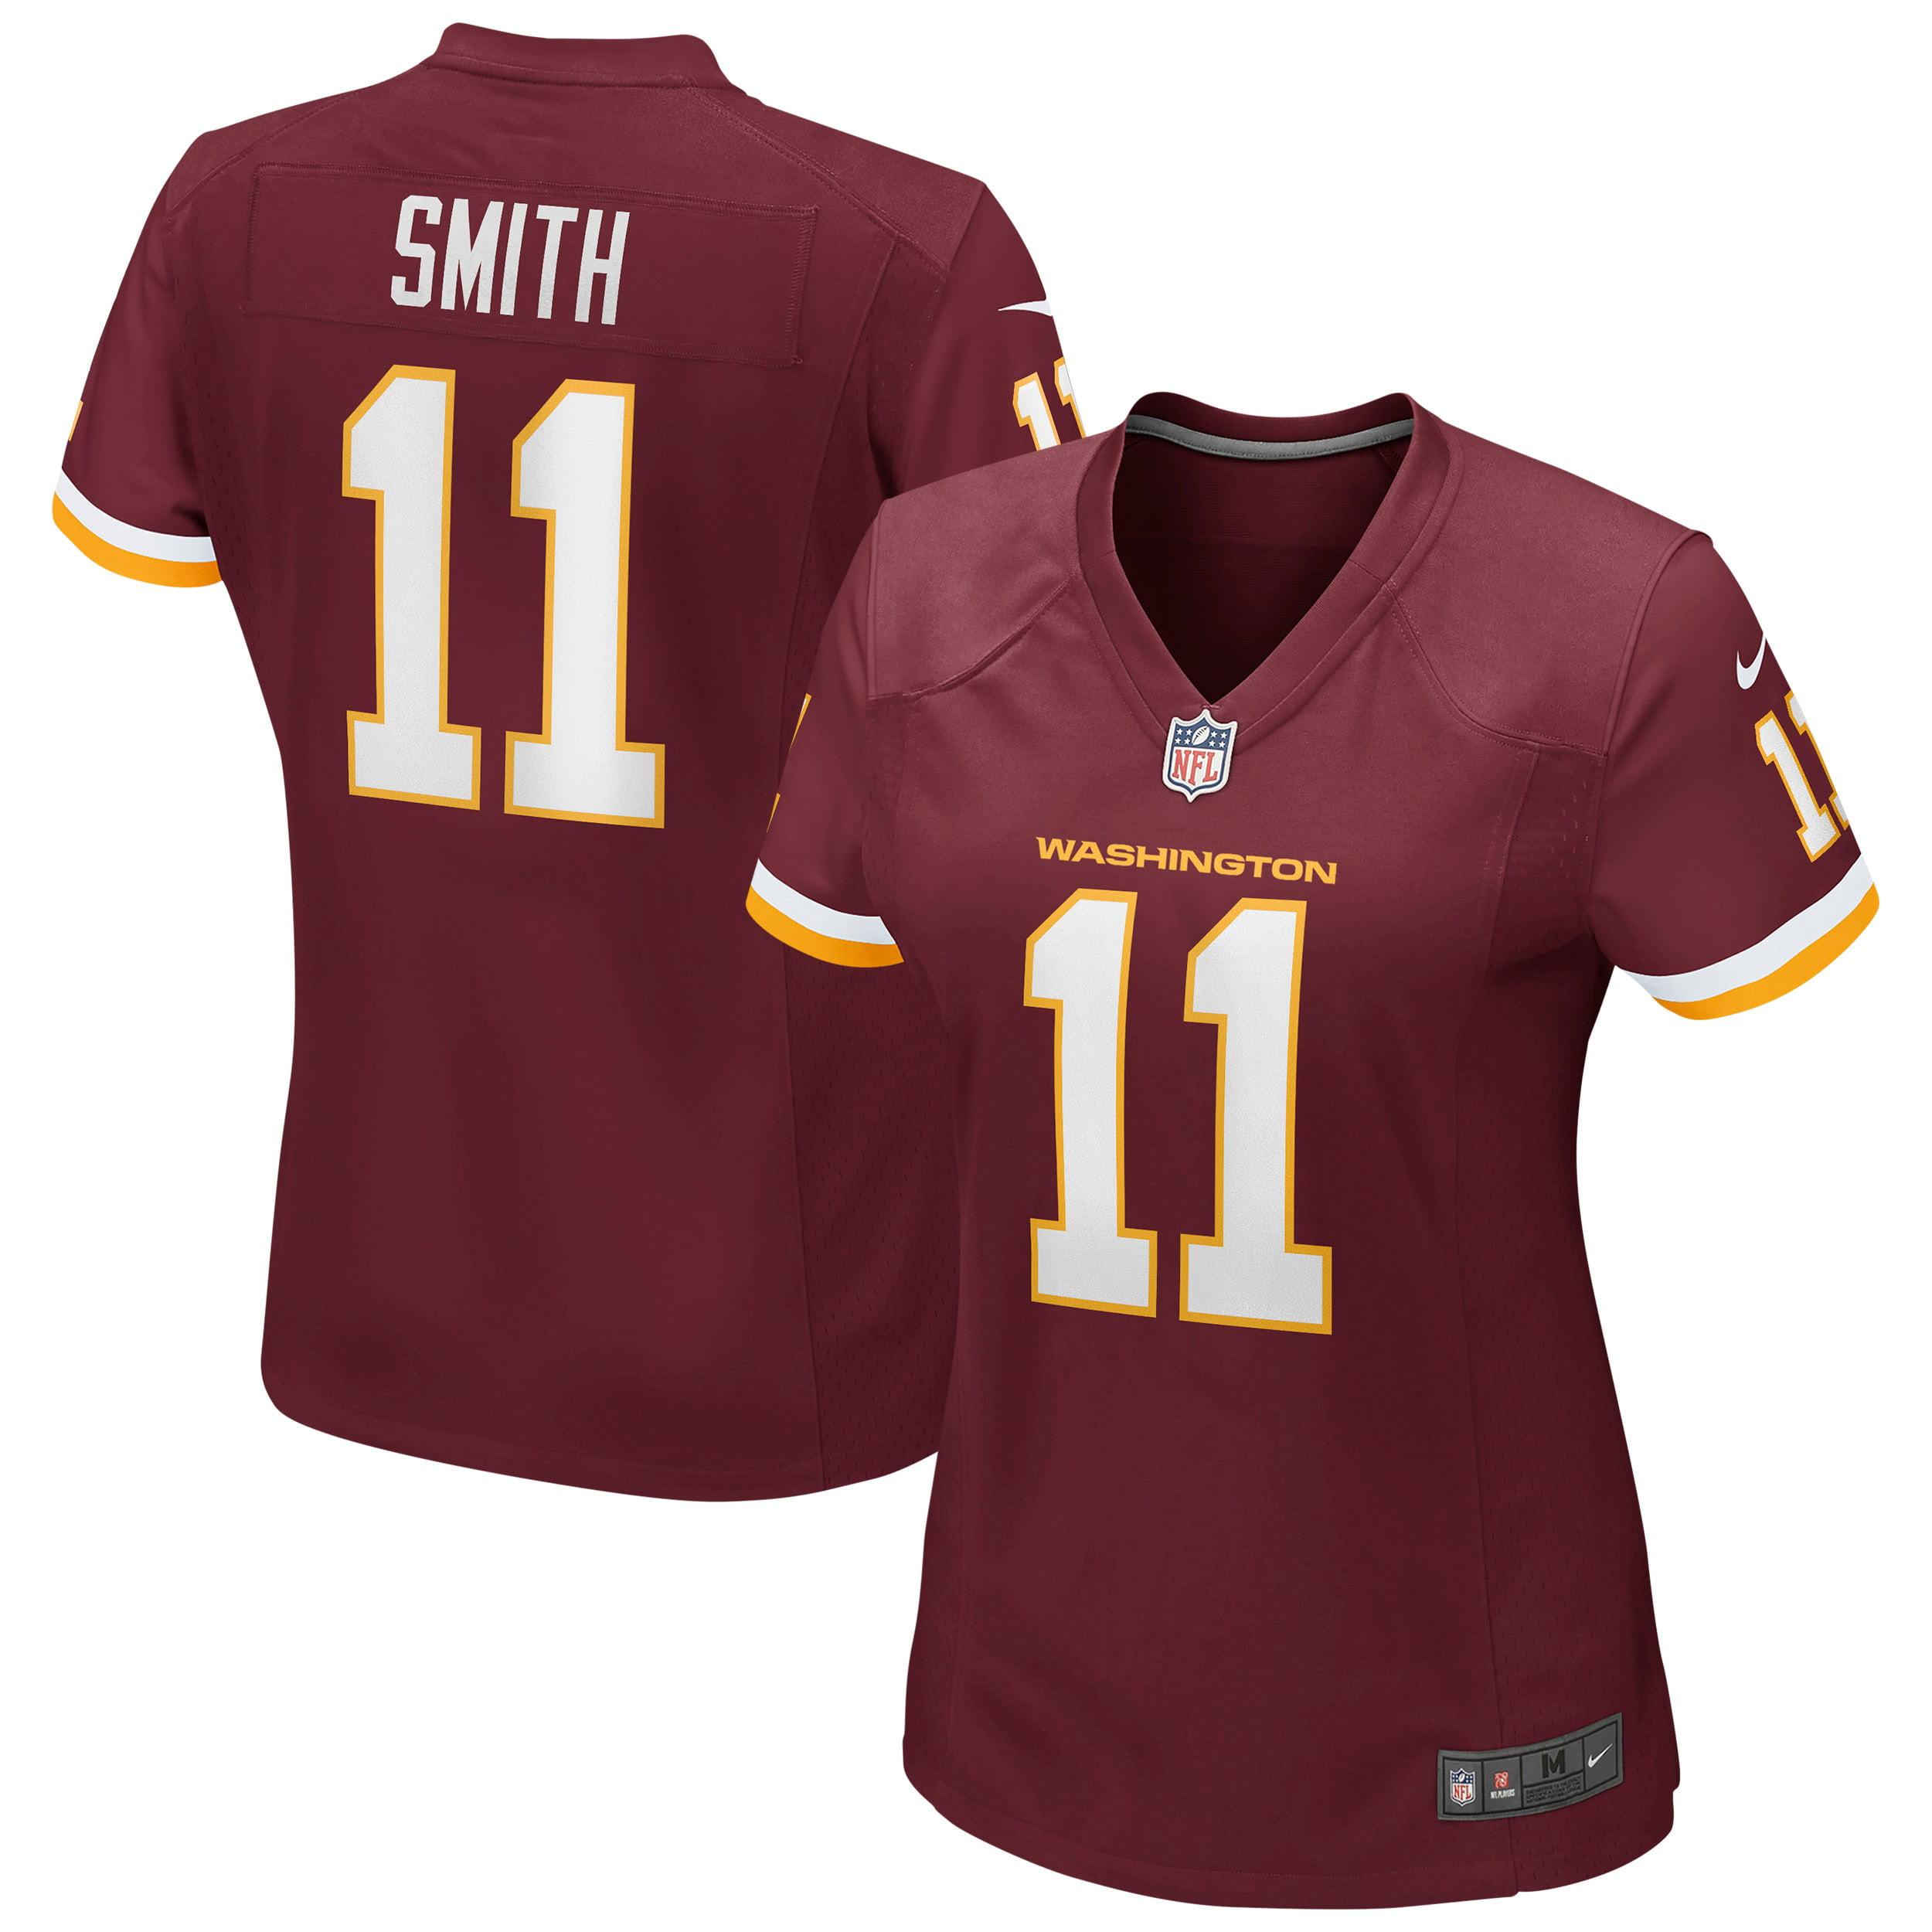 Alex Smith Washington Football Team Nike Women's Game Player Jersey -Burgundy - Walmart.com